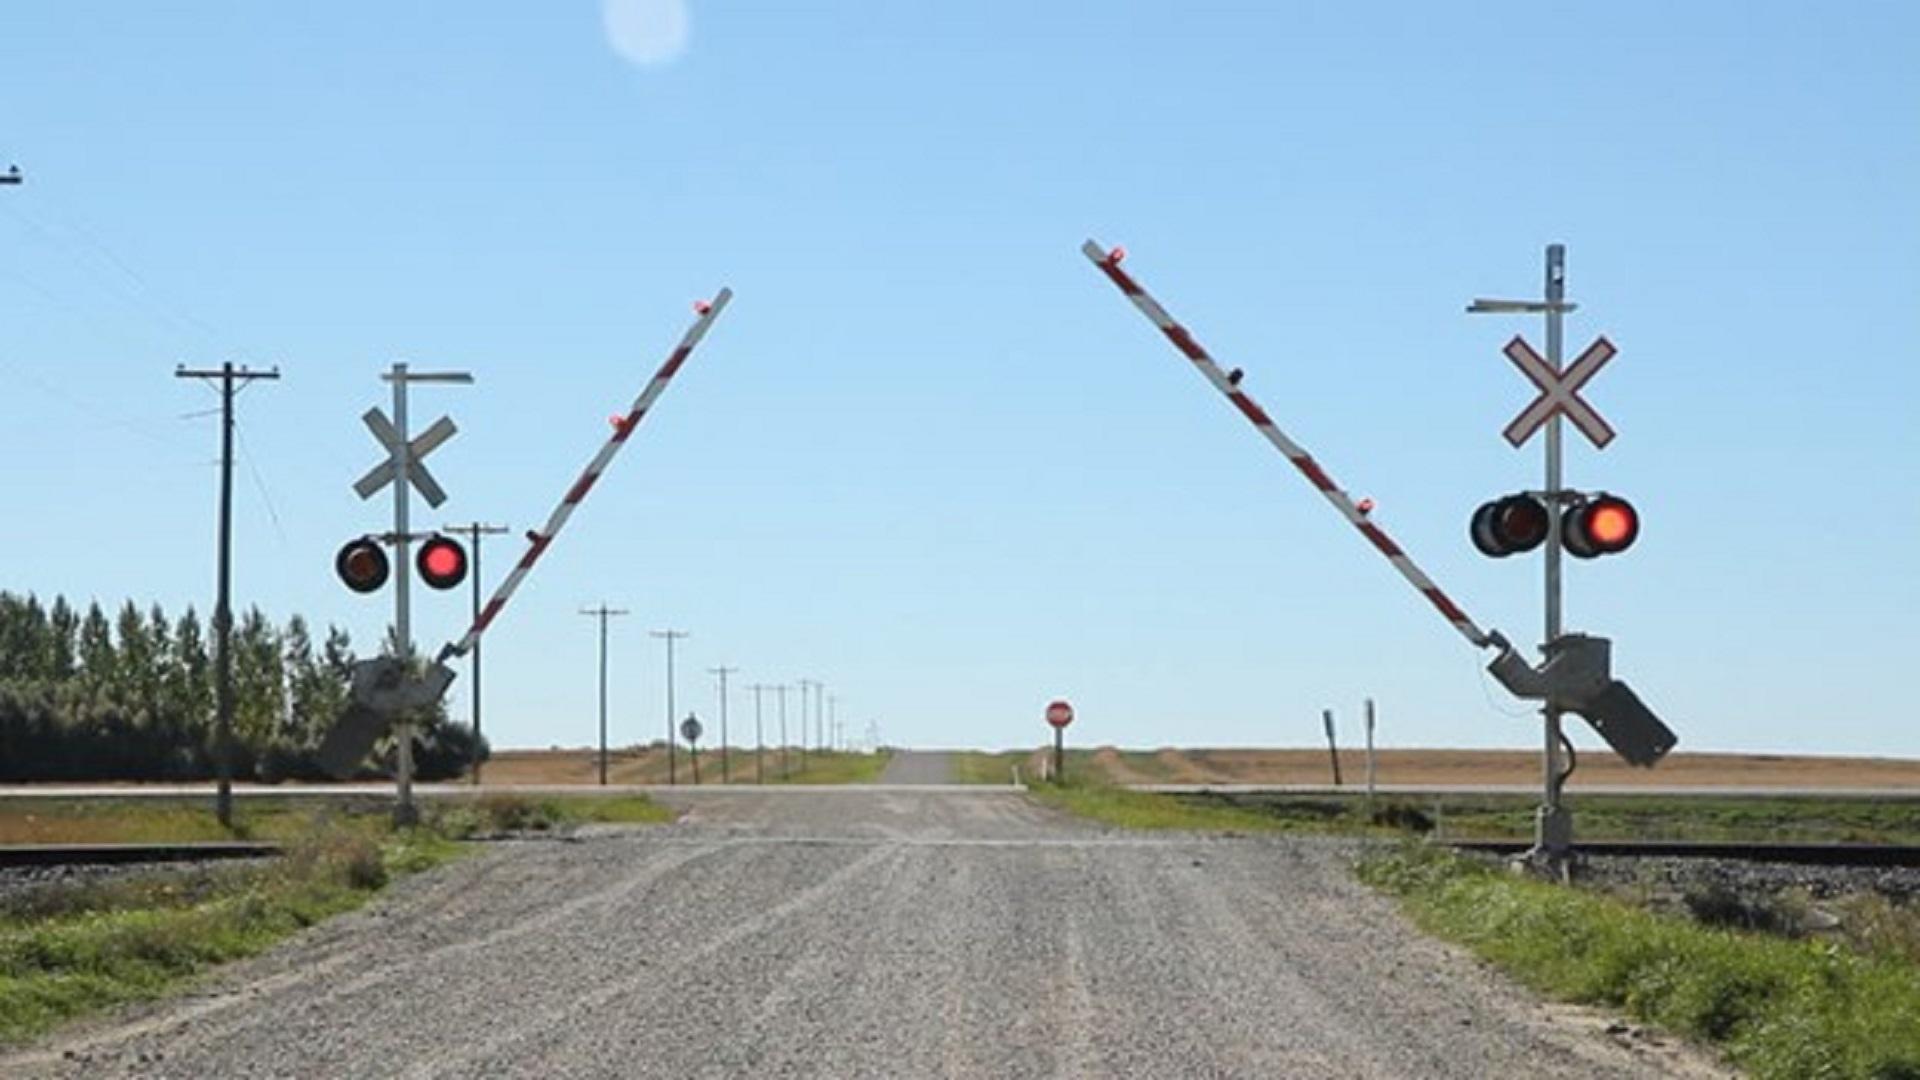 Safe Behaviour at Railway Crossings